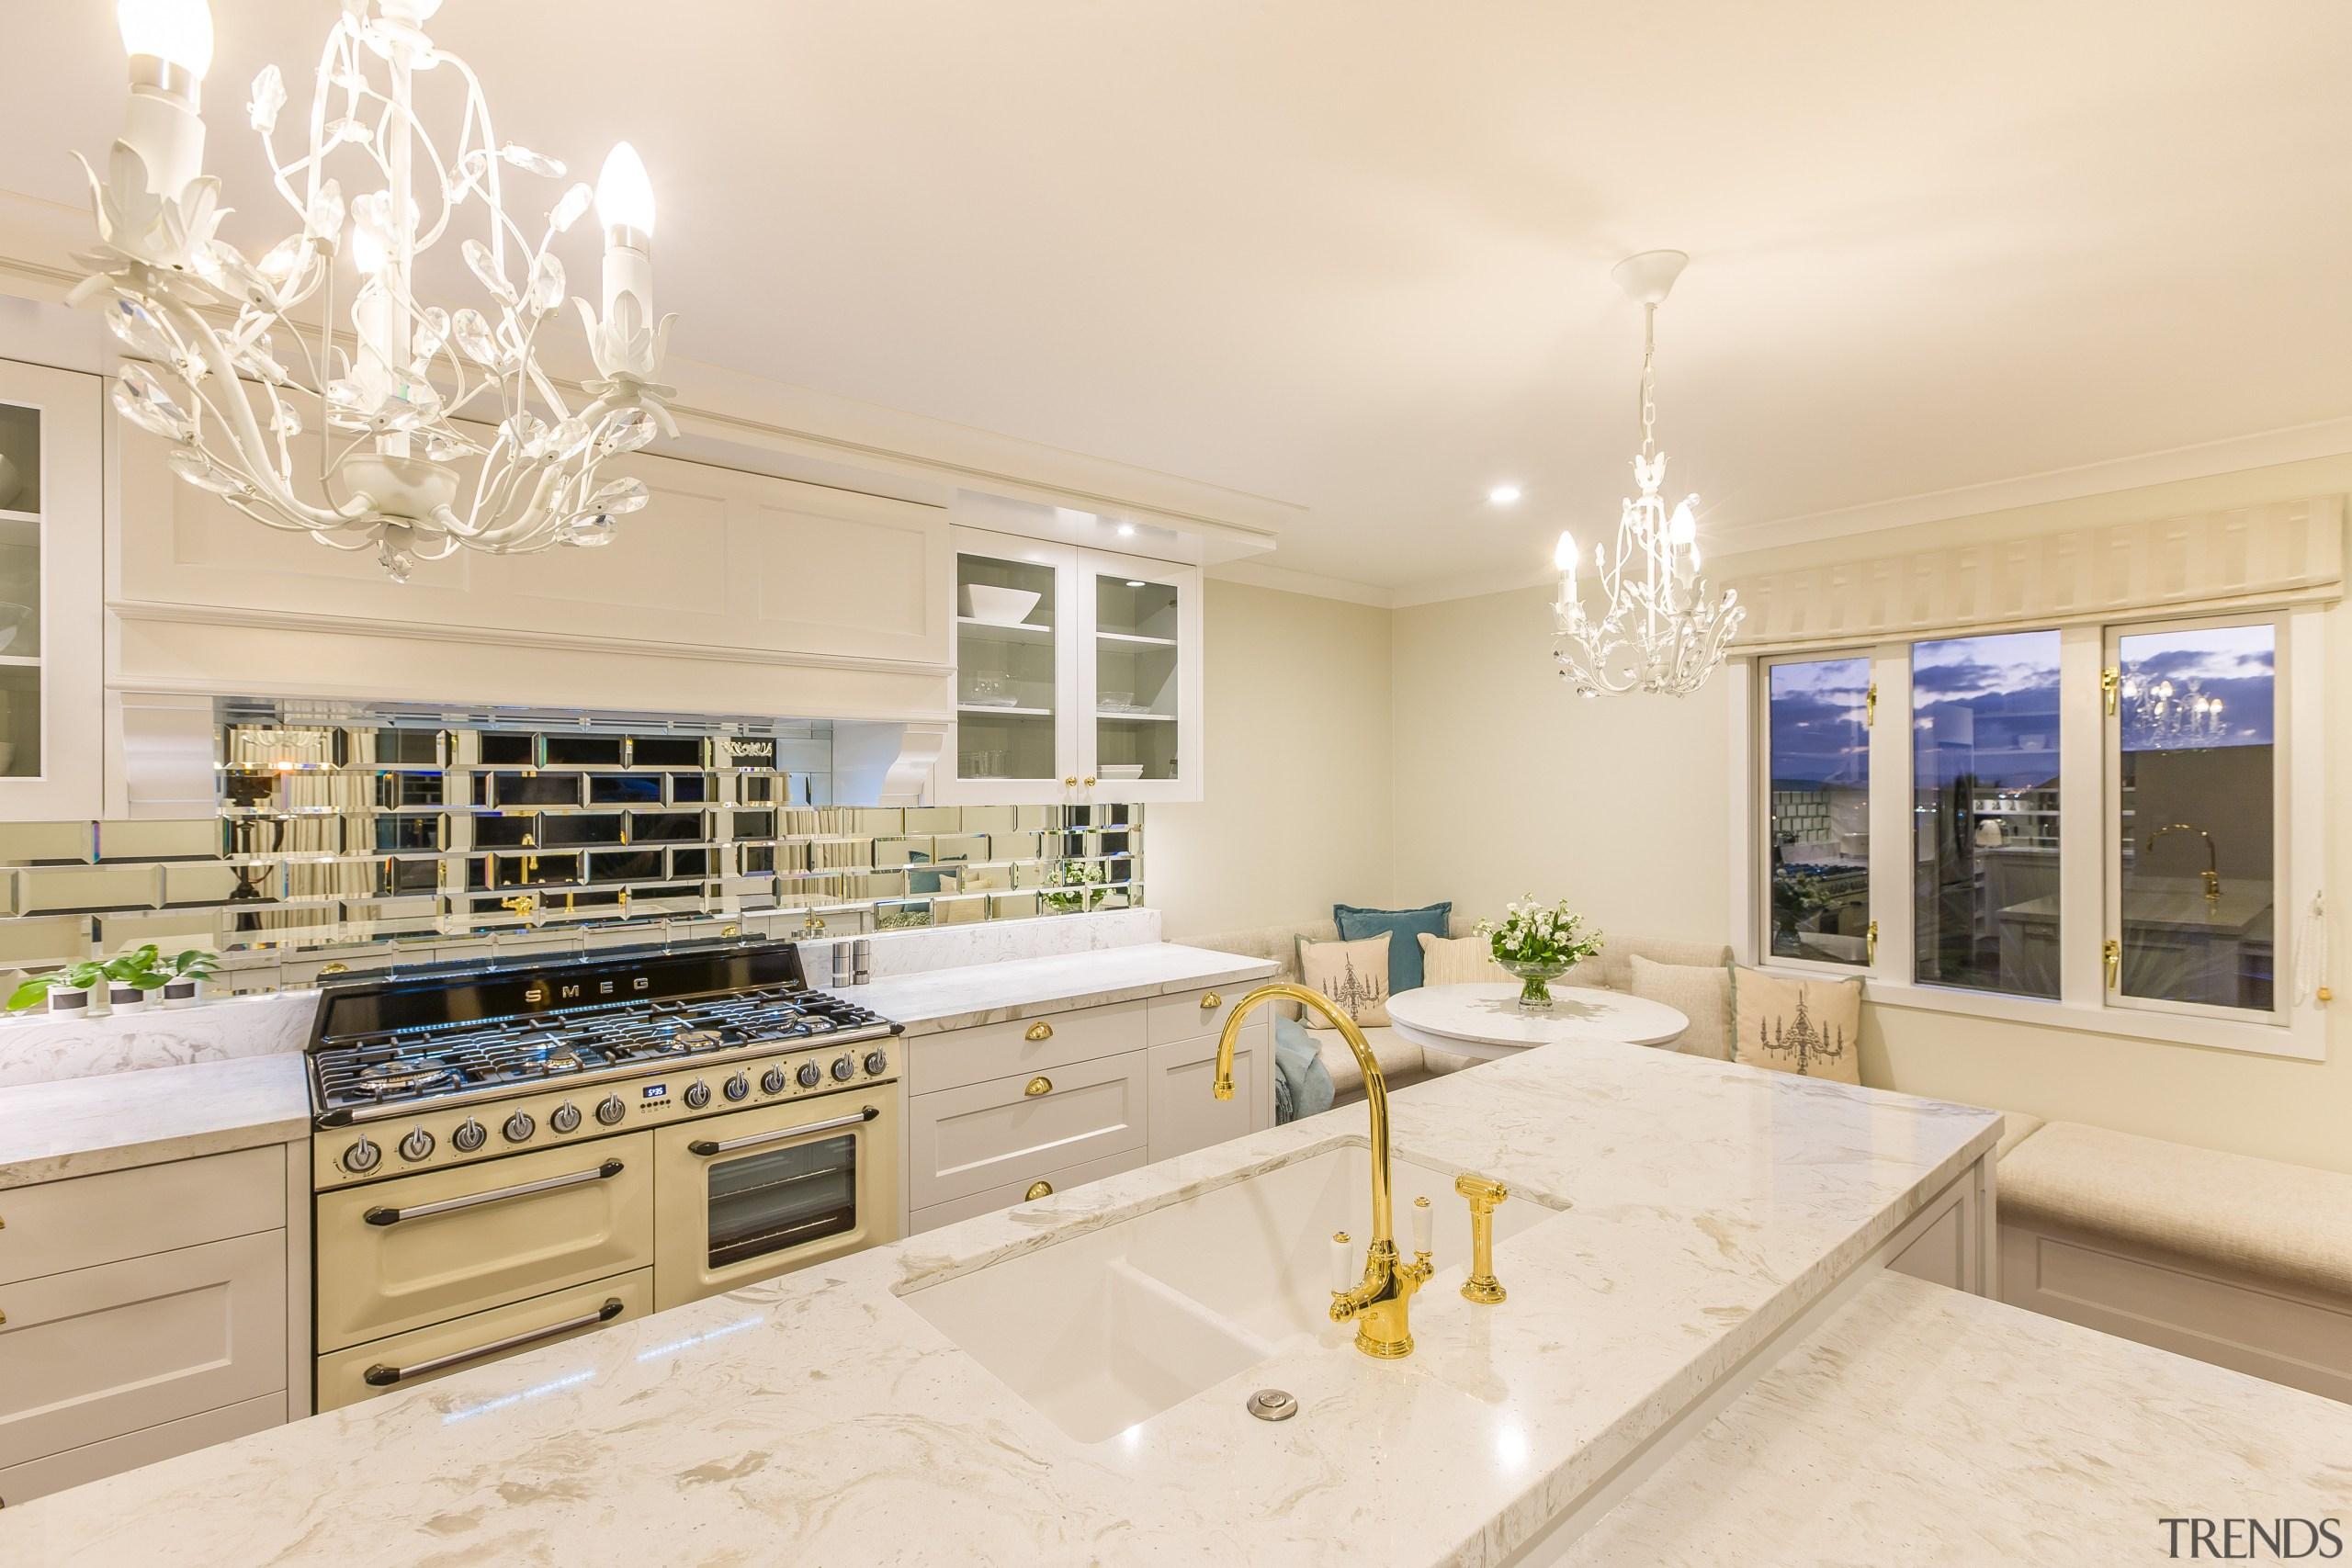 Sleek features and a Smeg Victoria cooker set countertop, cuisine classique, estate, home, interior design, kitchen, real estate, room, orange